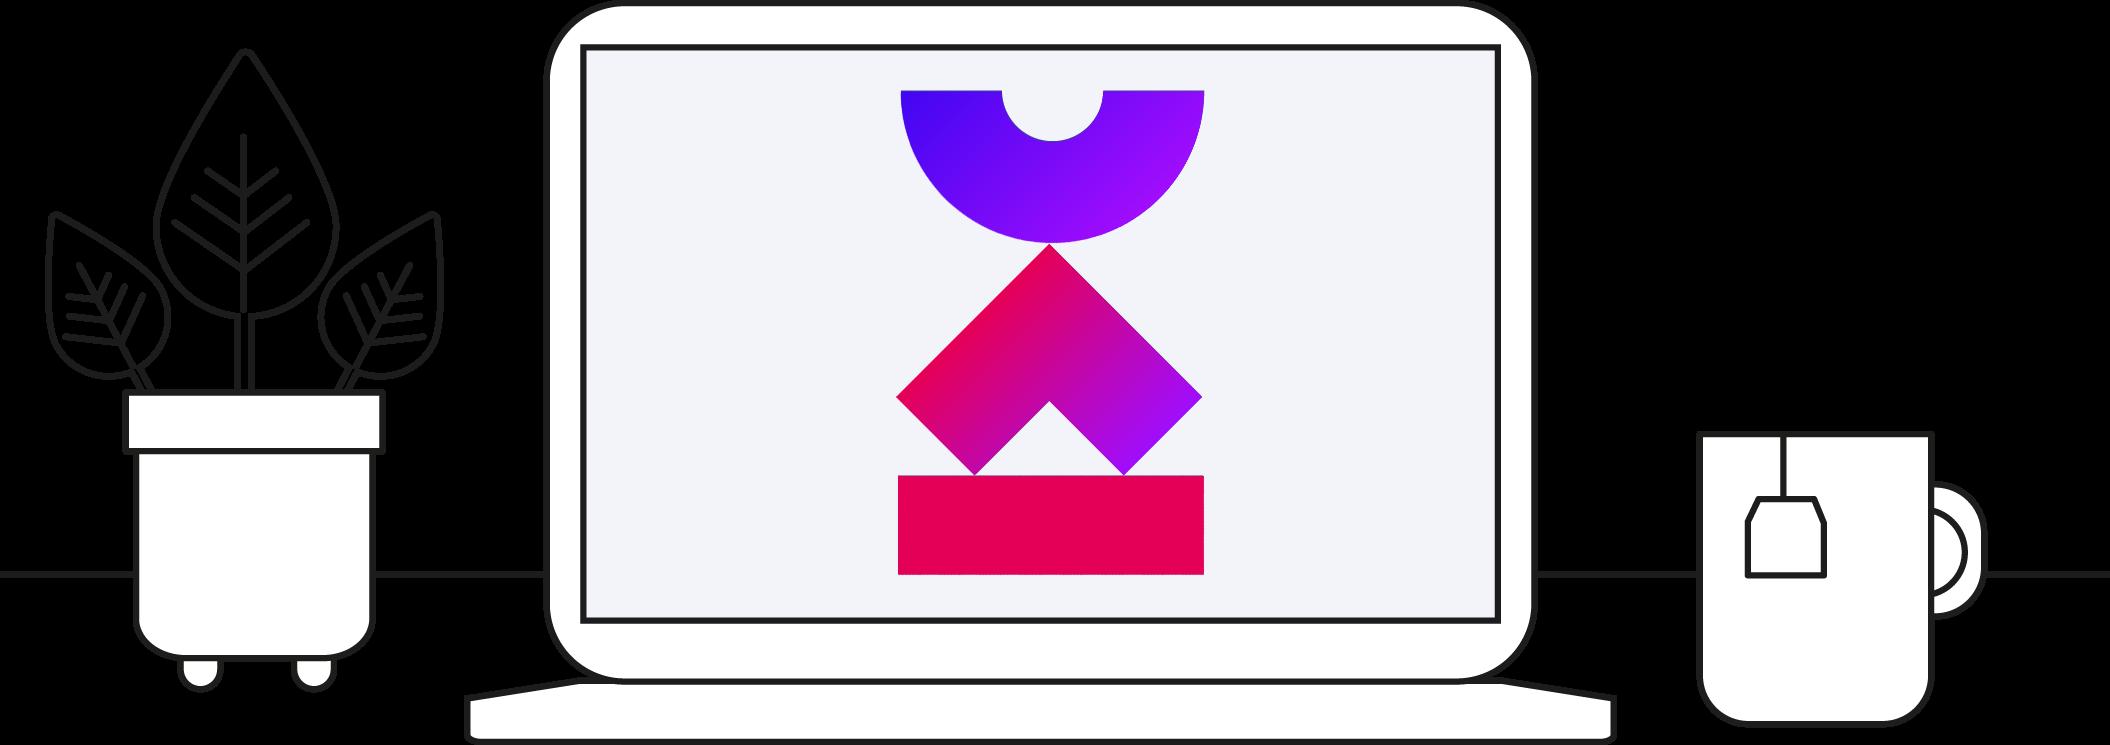 Desktop_plant